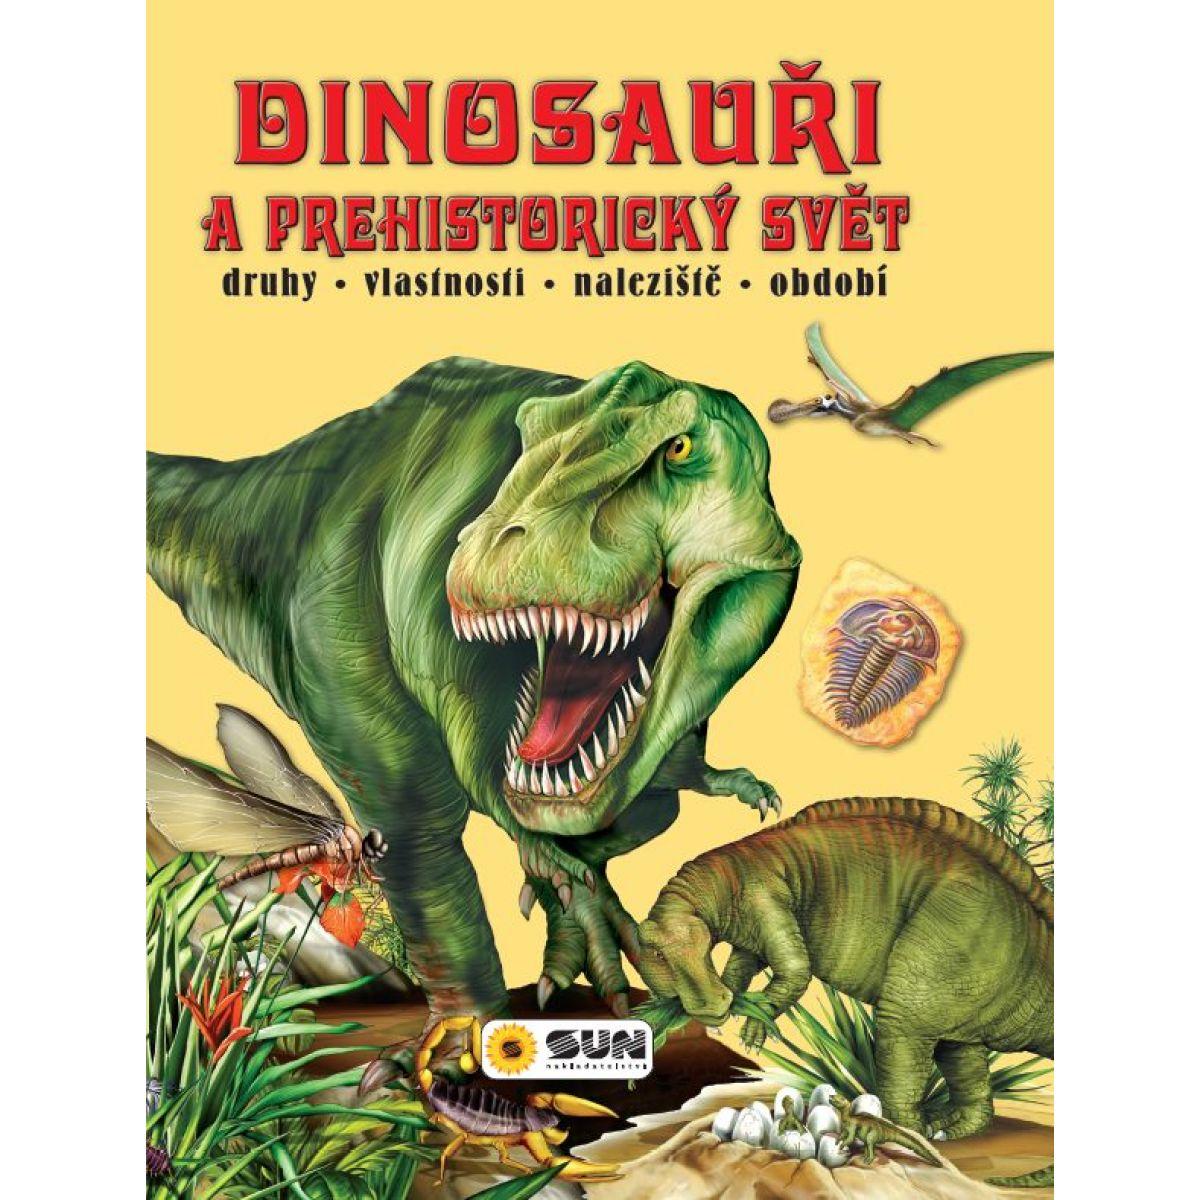 Sun Dinosaury a prehistorický svet